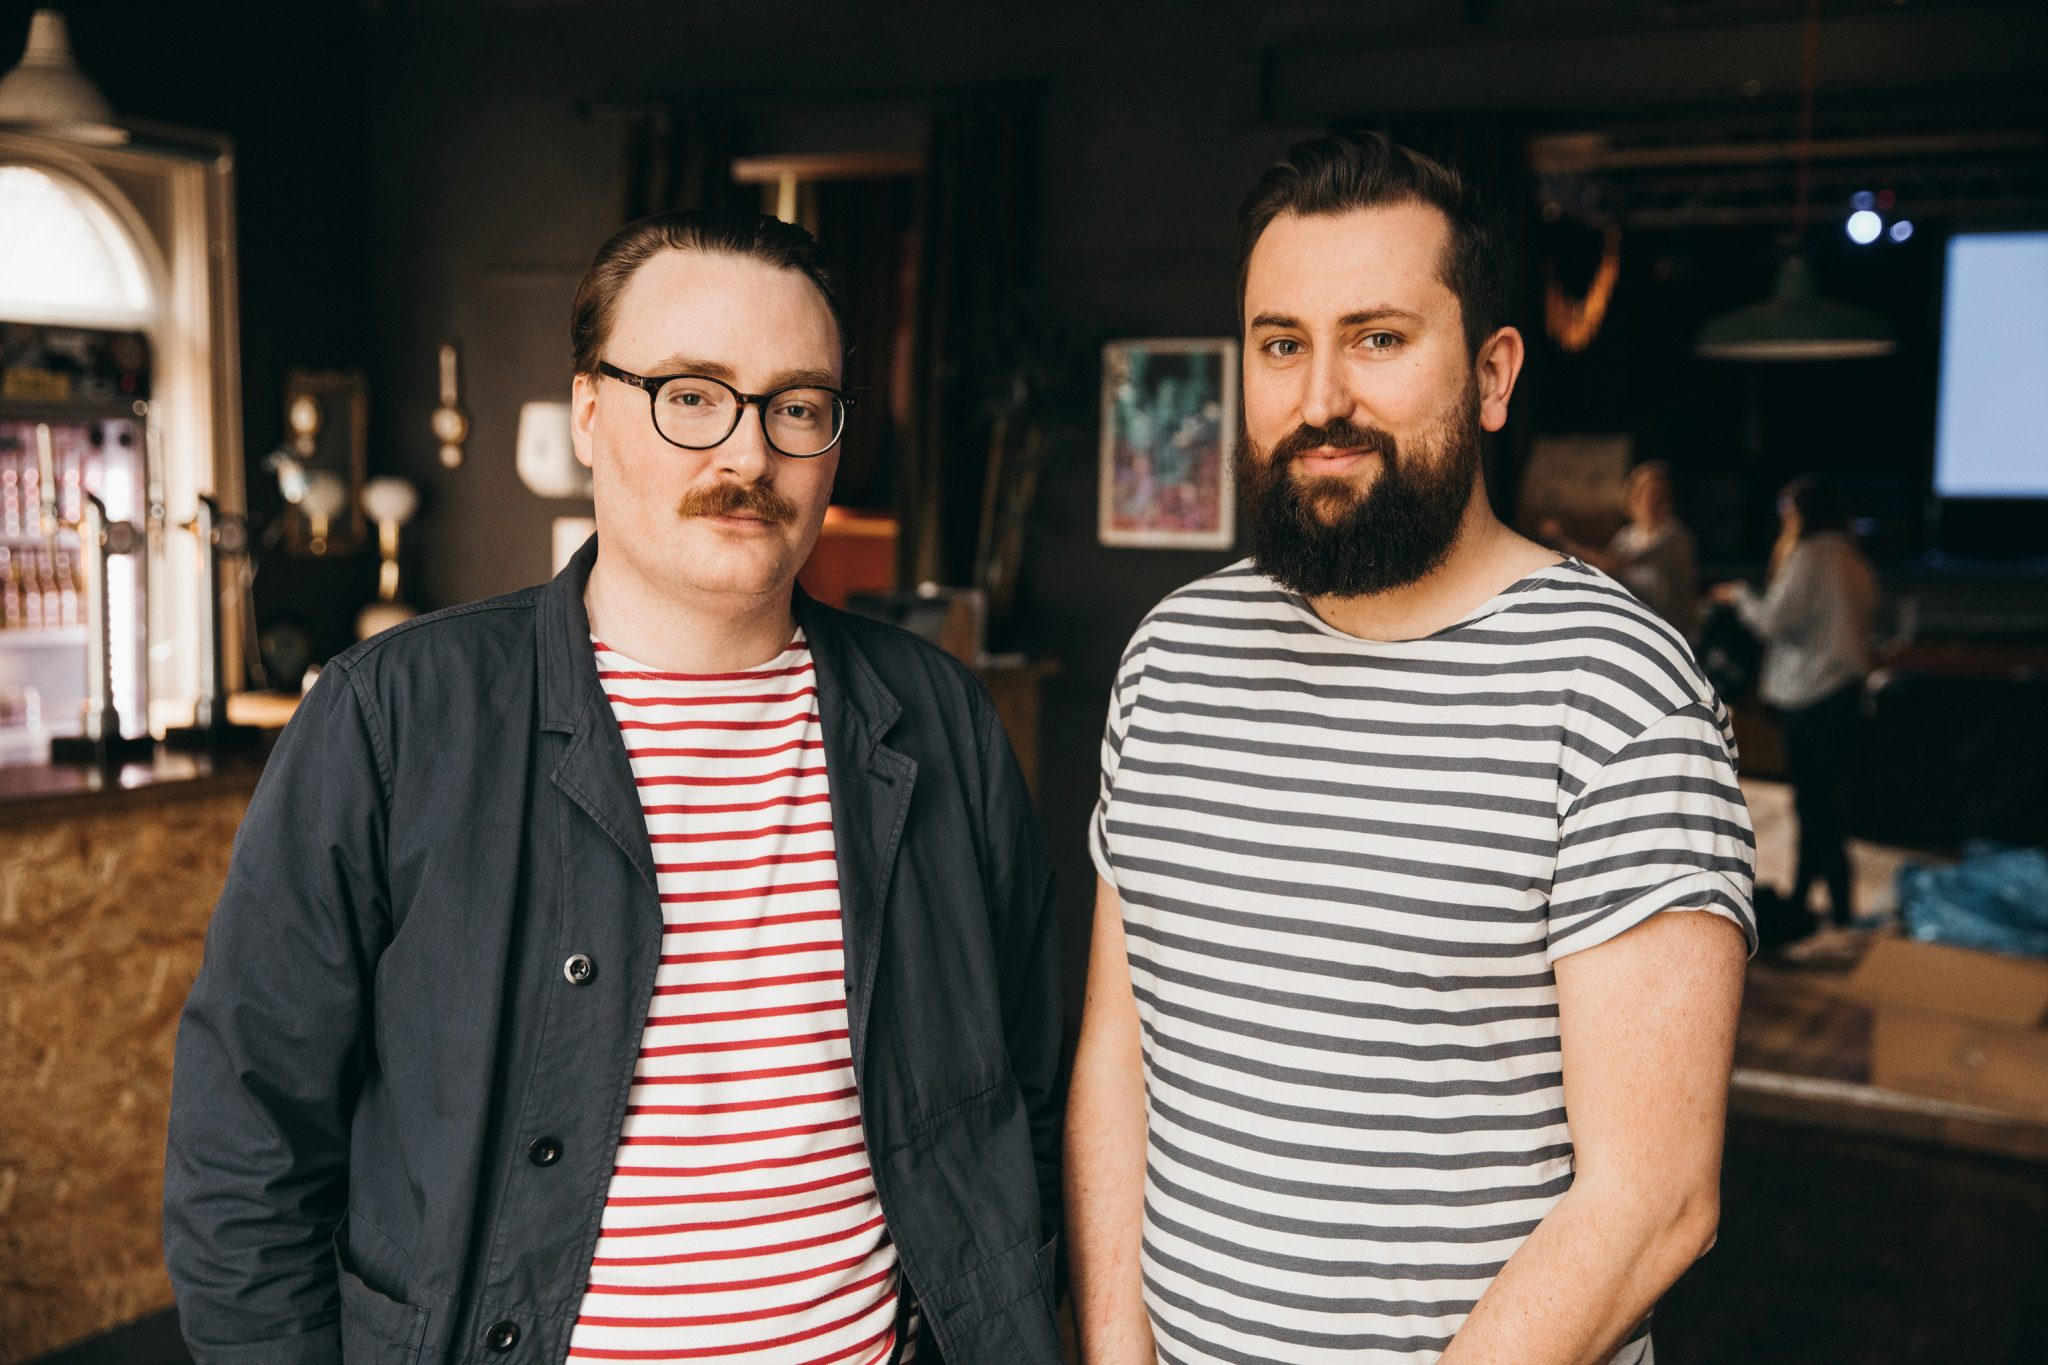 Mat Dix and Simon Fogel